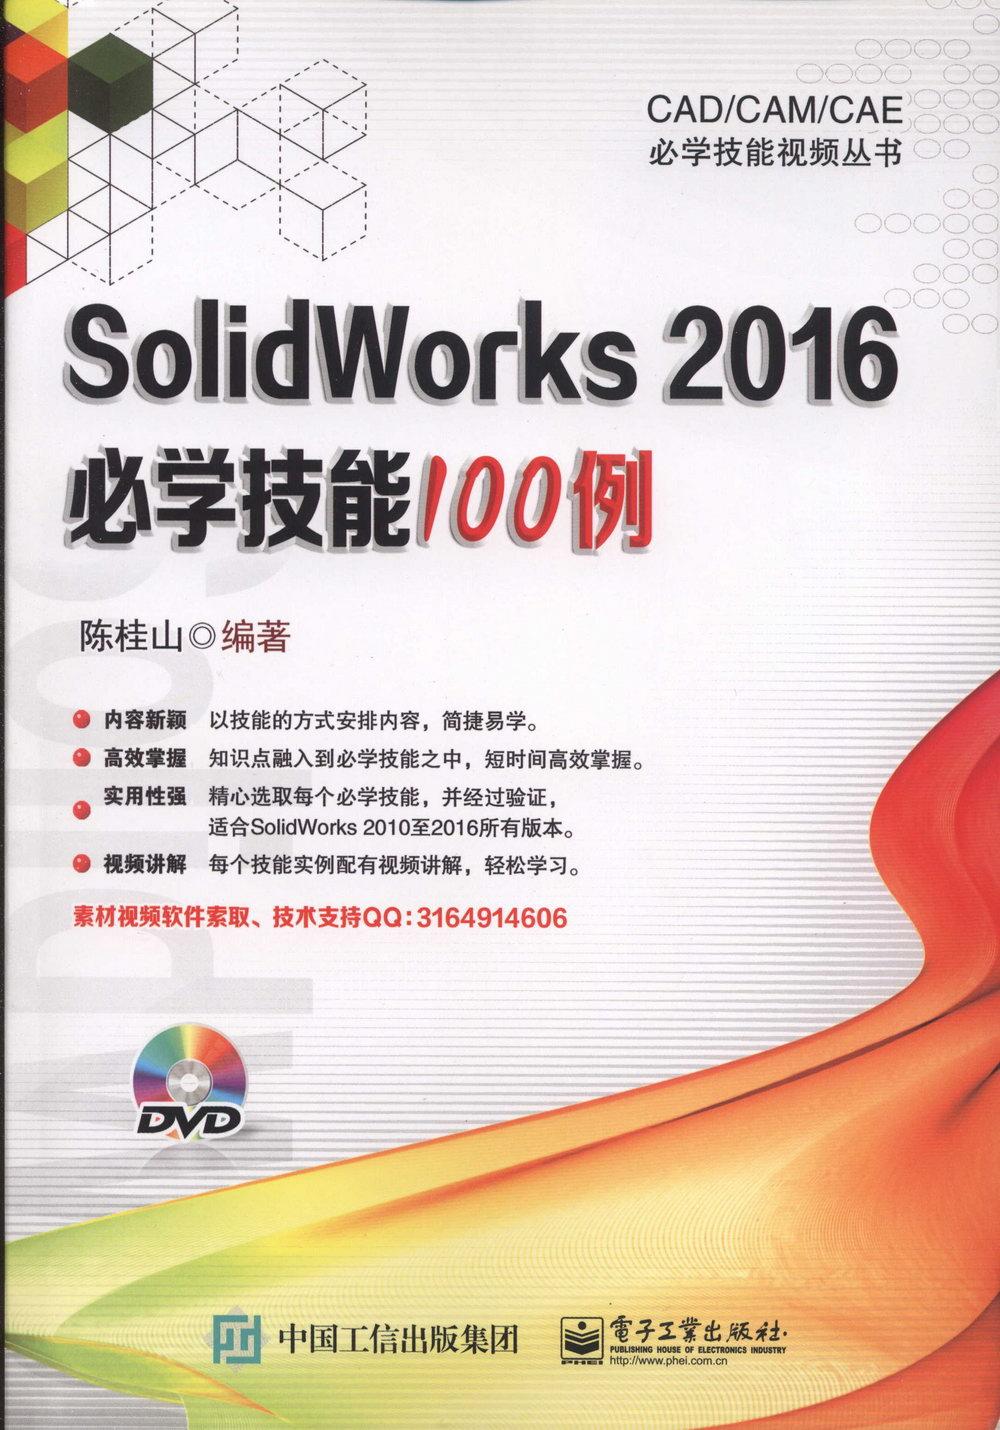 SolidWorks 2016必學技能100例